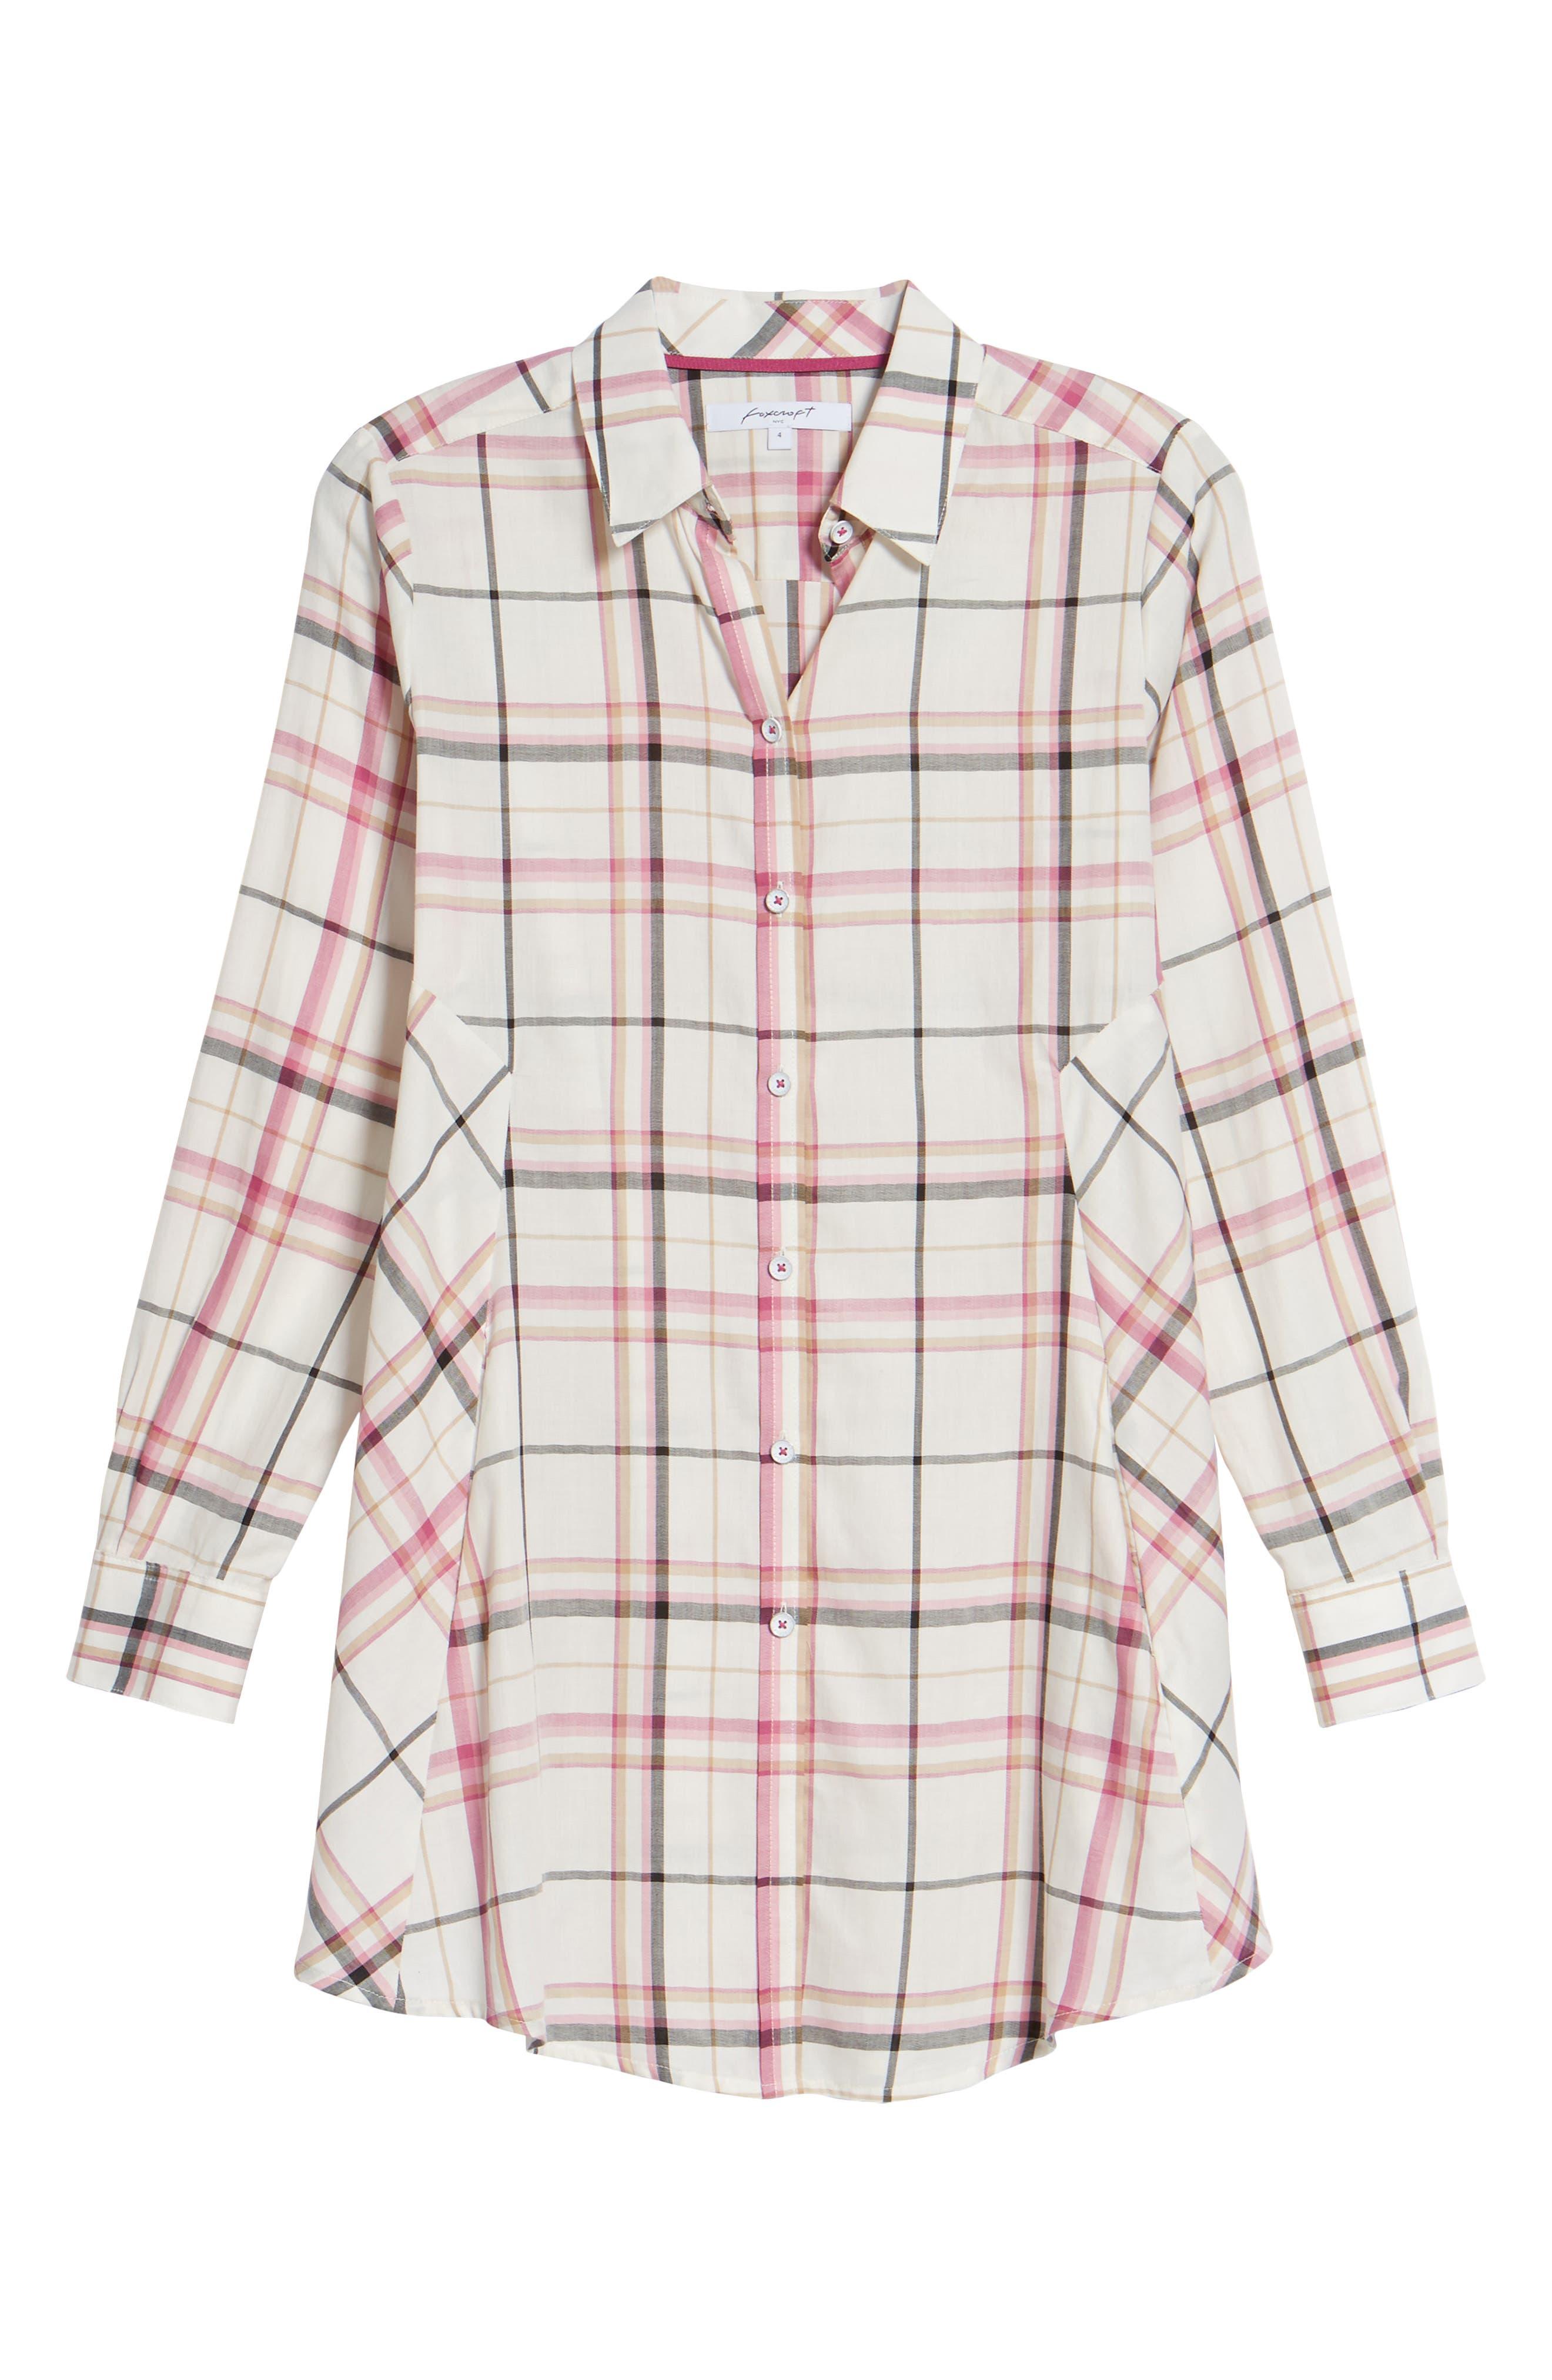 Main Image - Foxcroft Cici Plaid Shirt